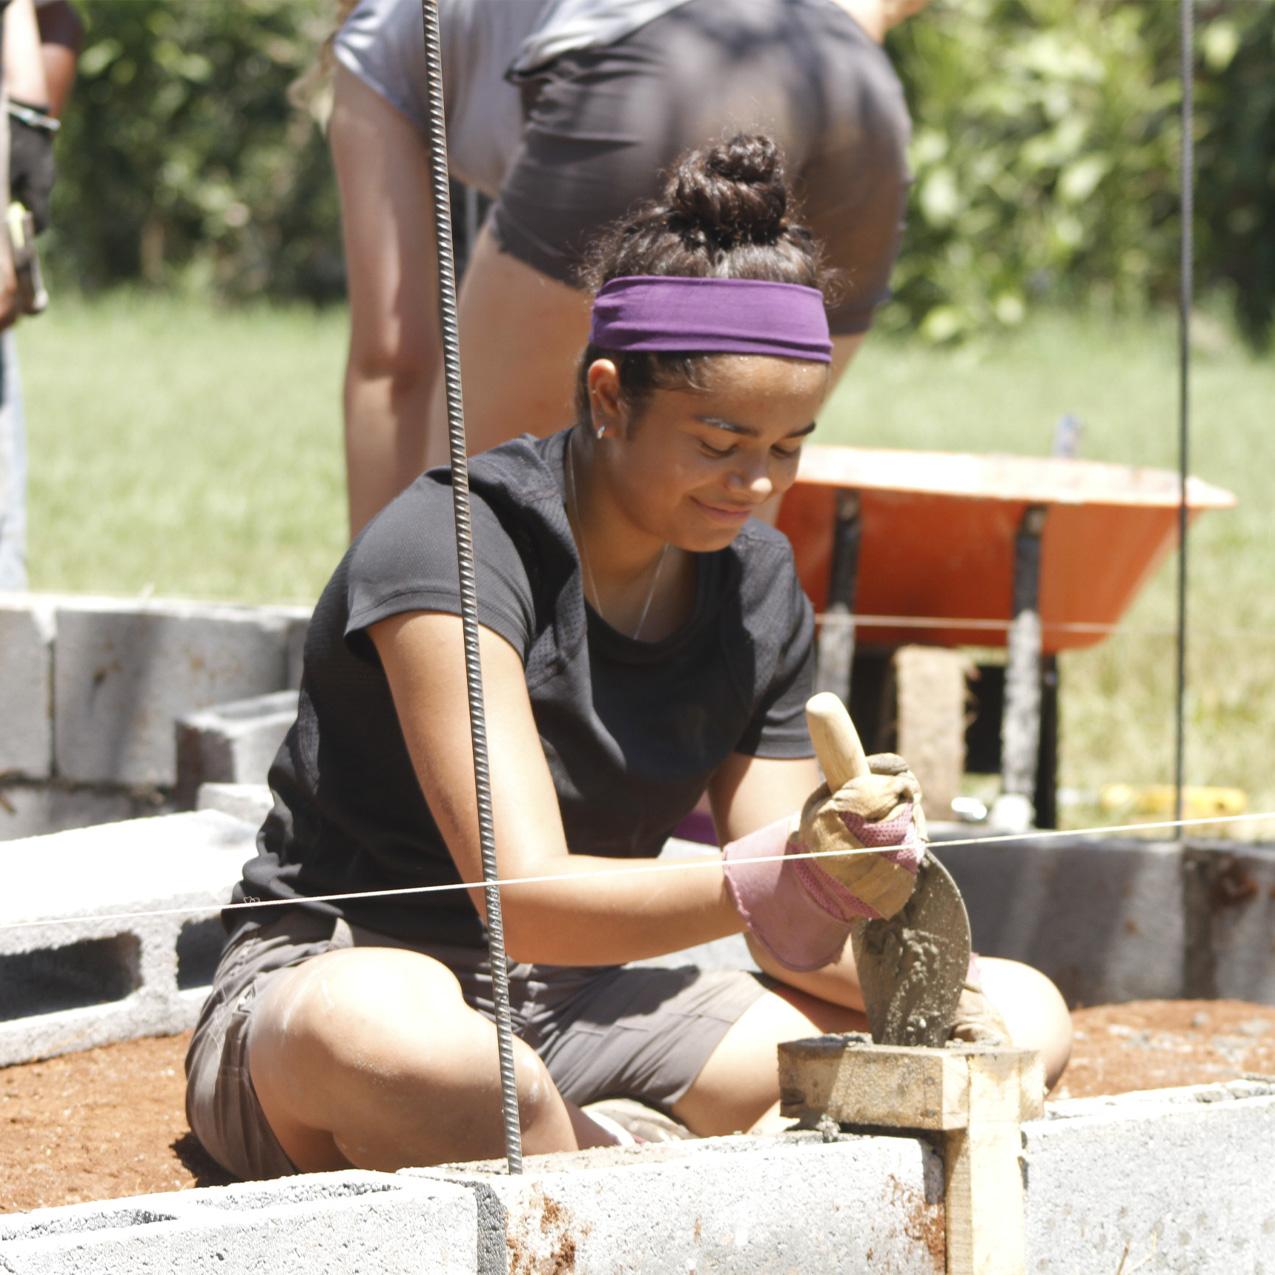 school_expedition_costa_rica_scuba_community_projects